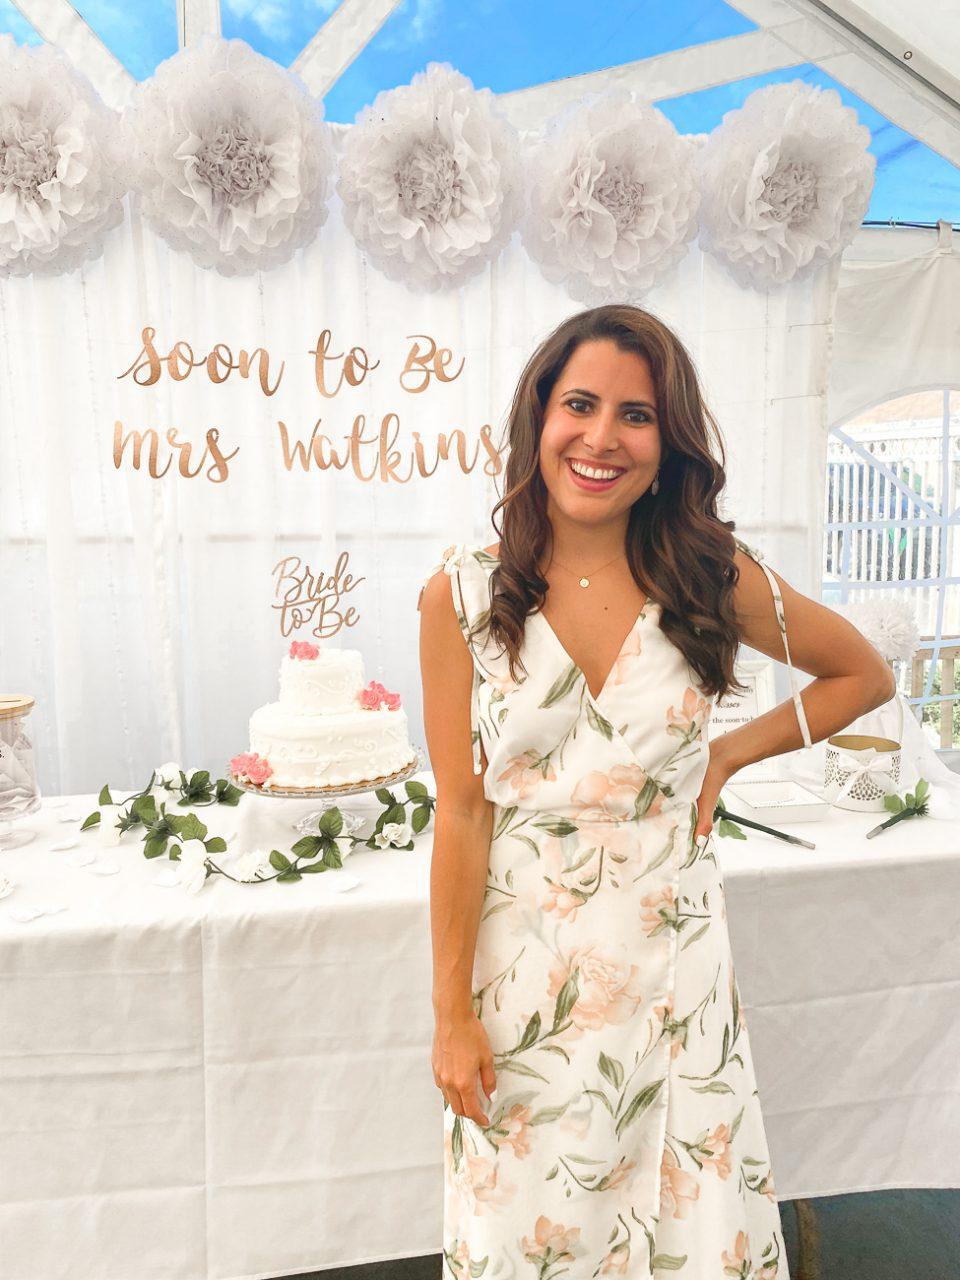 Summer Bridal Shower Decoration Ideas